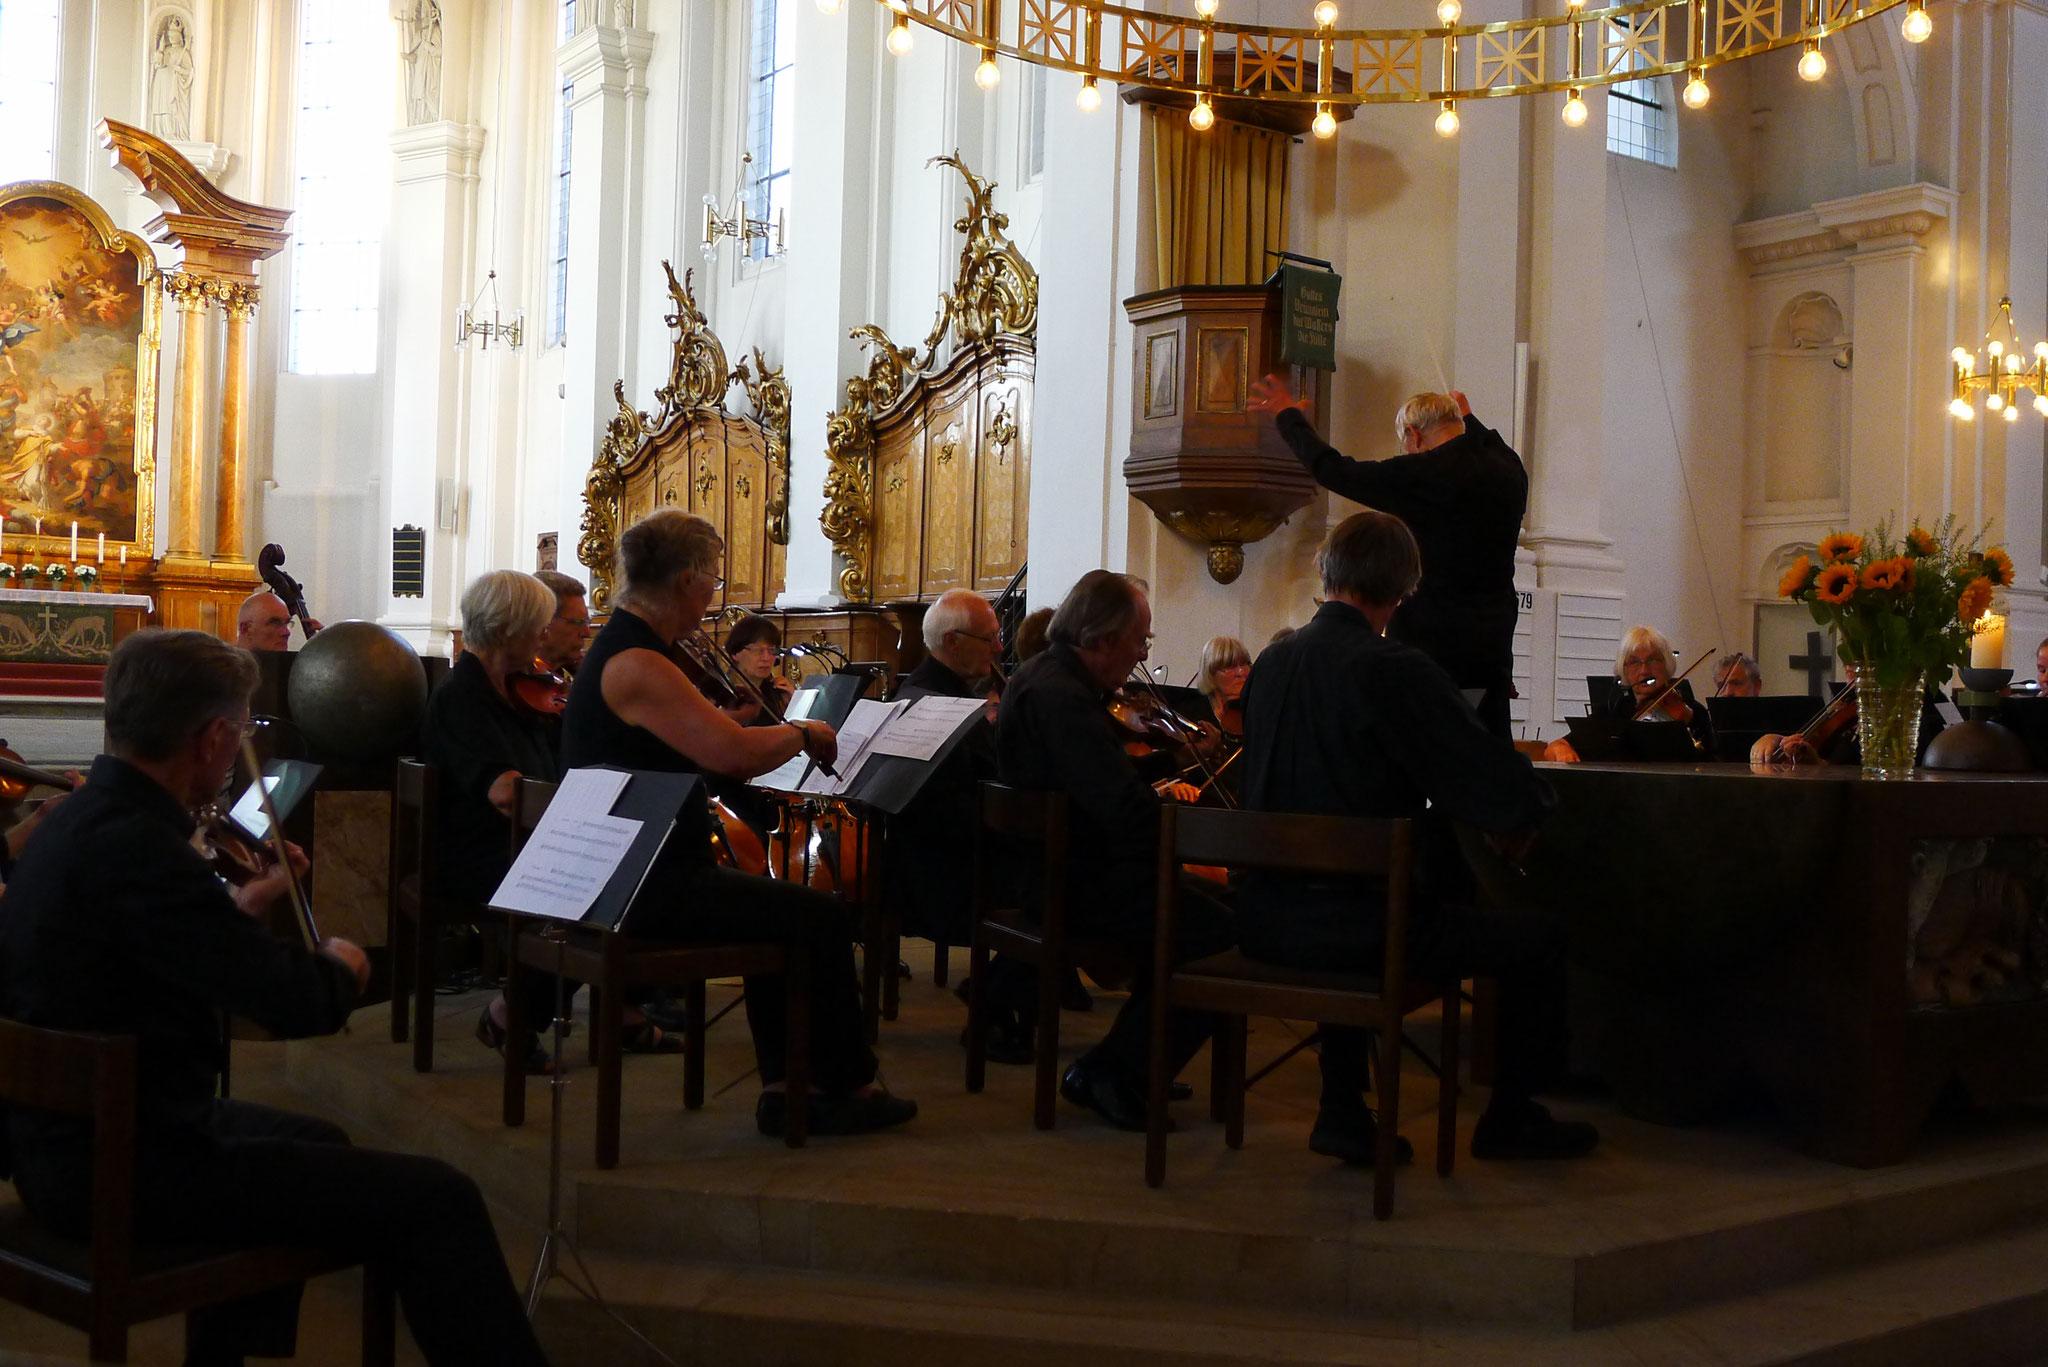 Evangelische Kirche St. Stephan Bamberg - 9. Juli 2016